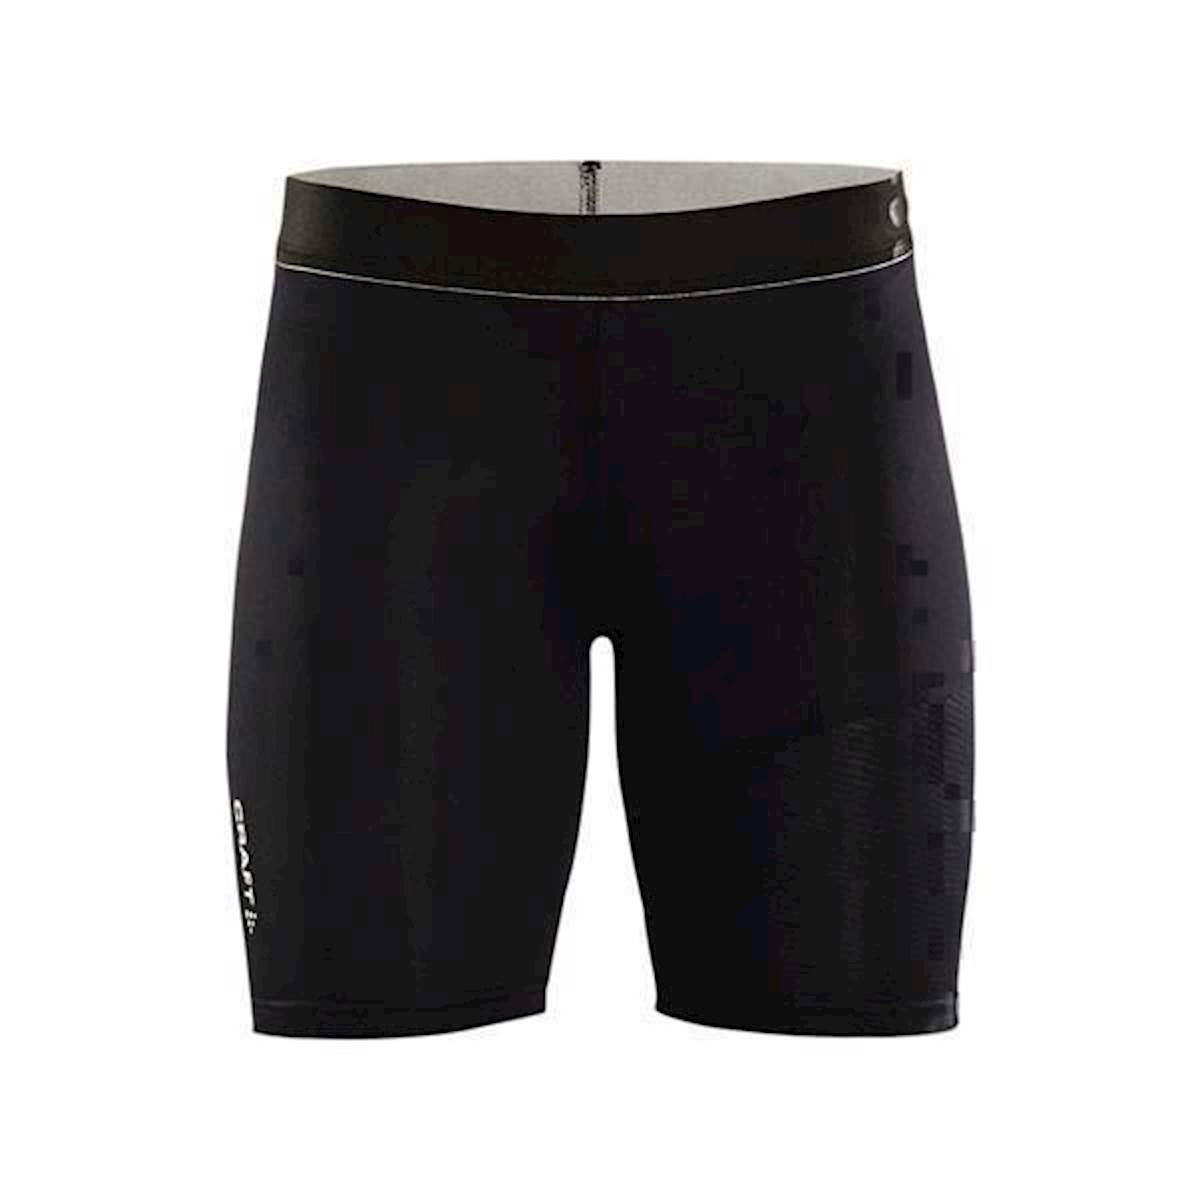 d3aa4b8d40bc Craft - Nohavice CRAFT Shade Shorts černá 1905853-999221